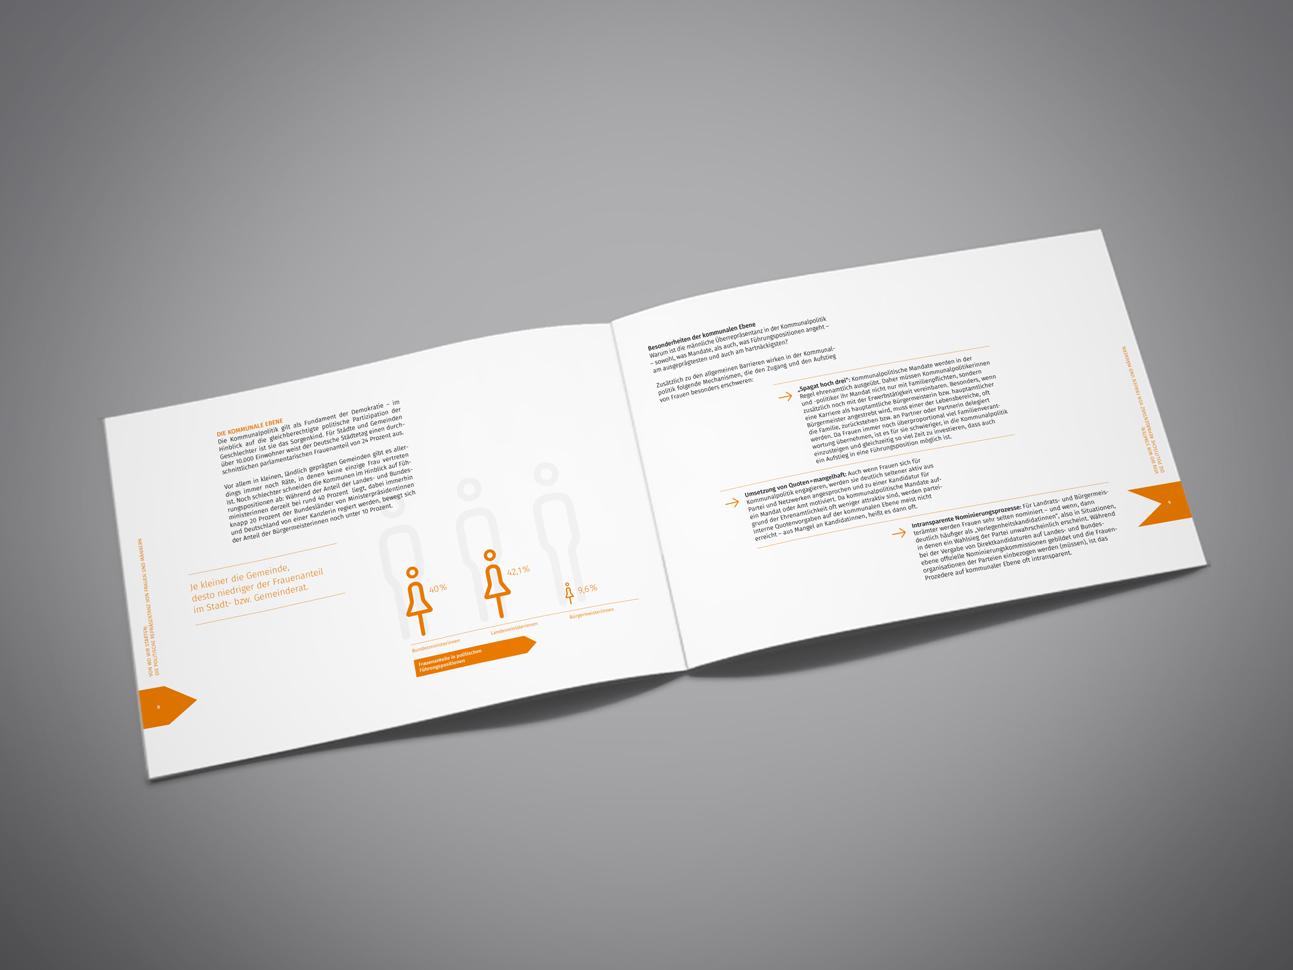 martin_zech_design_projekt-design_paritaet-in-der-politik_wegweiser_doppelseite-1